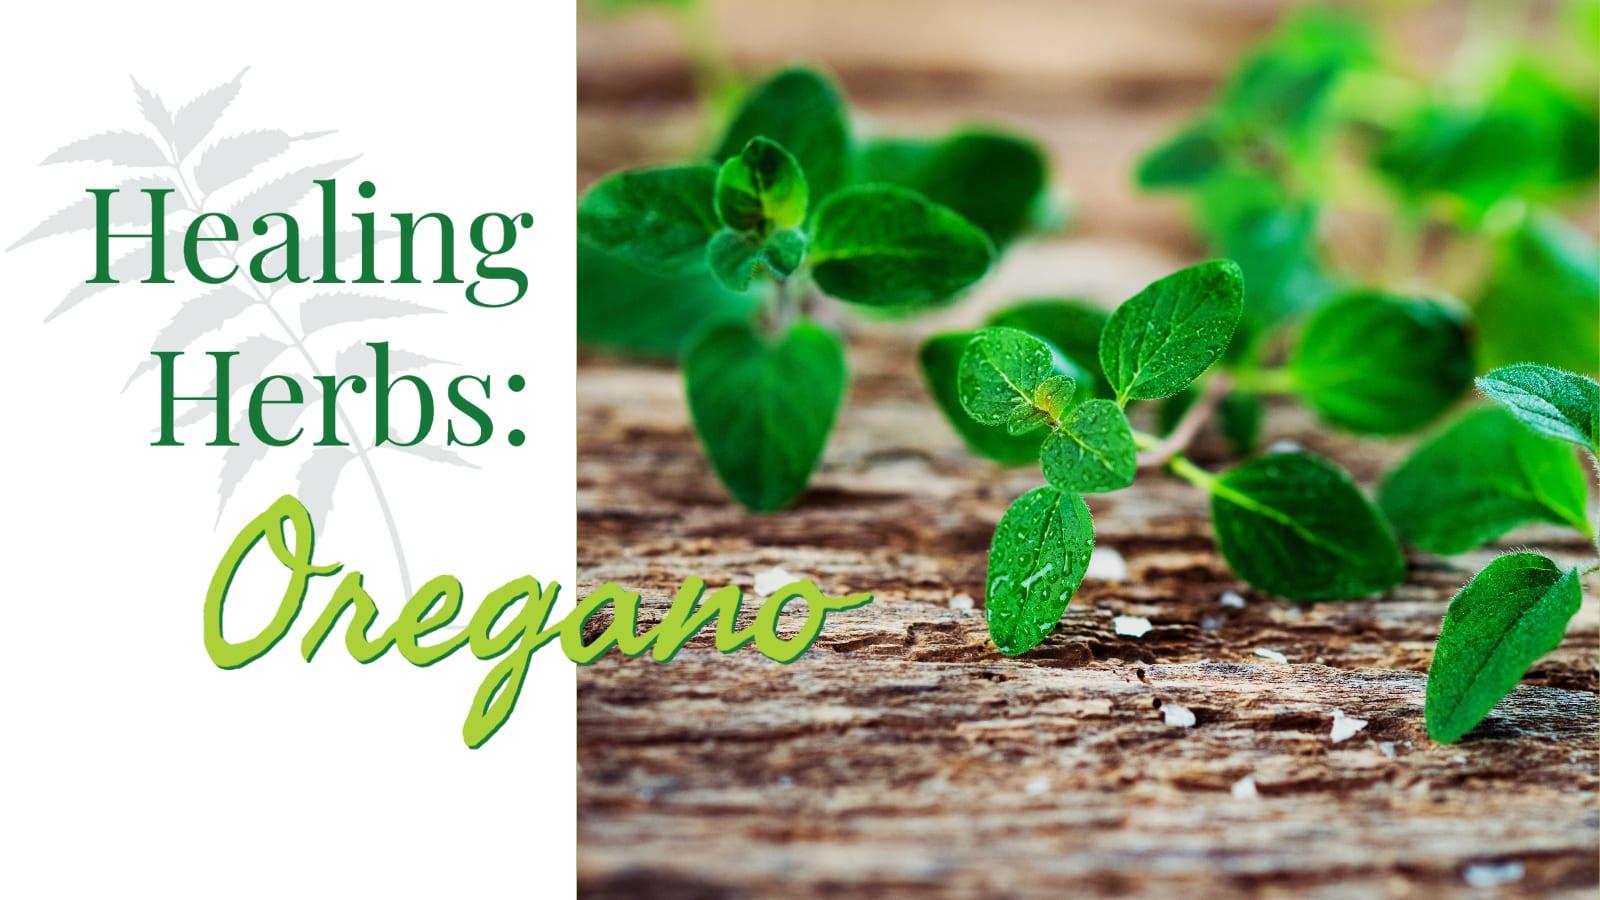 Healing Herbs: Oregano